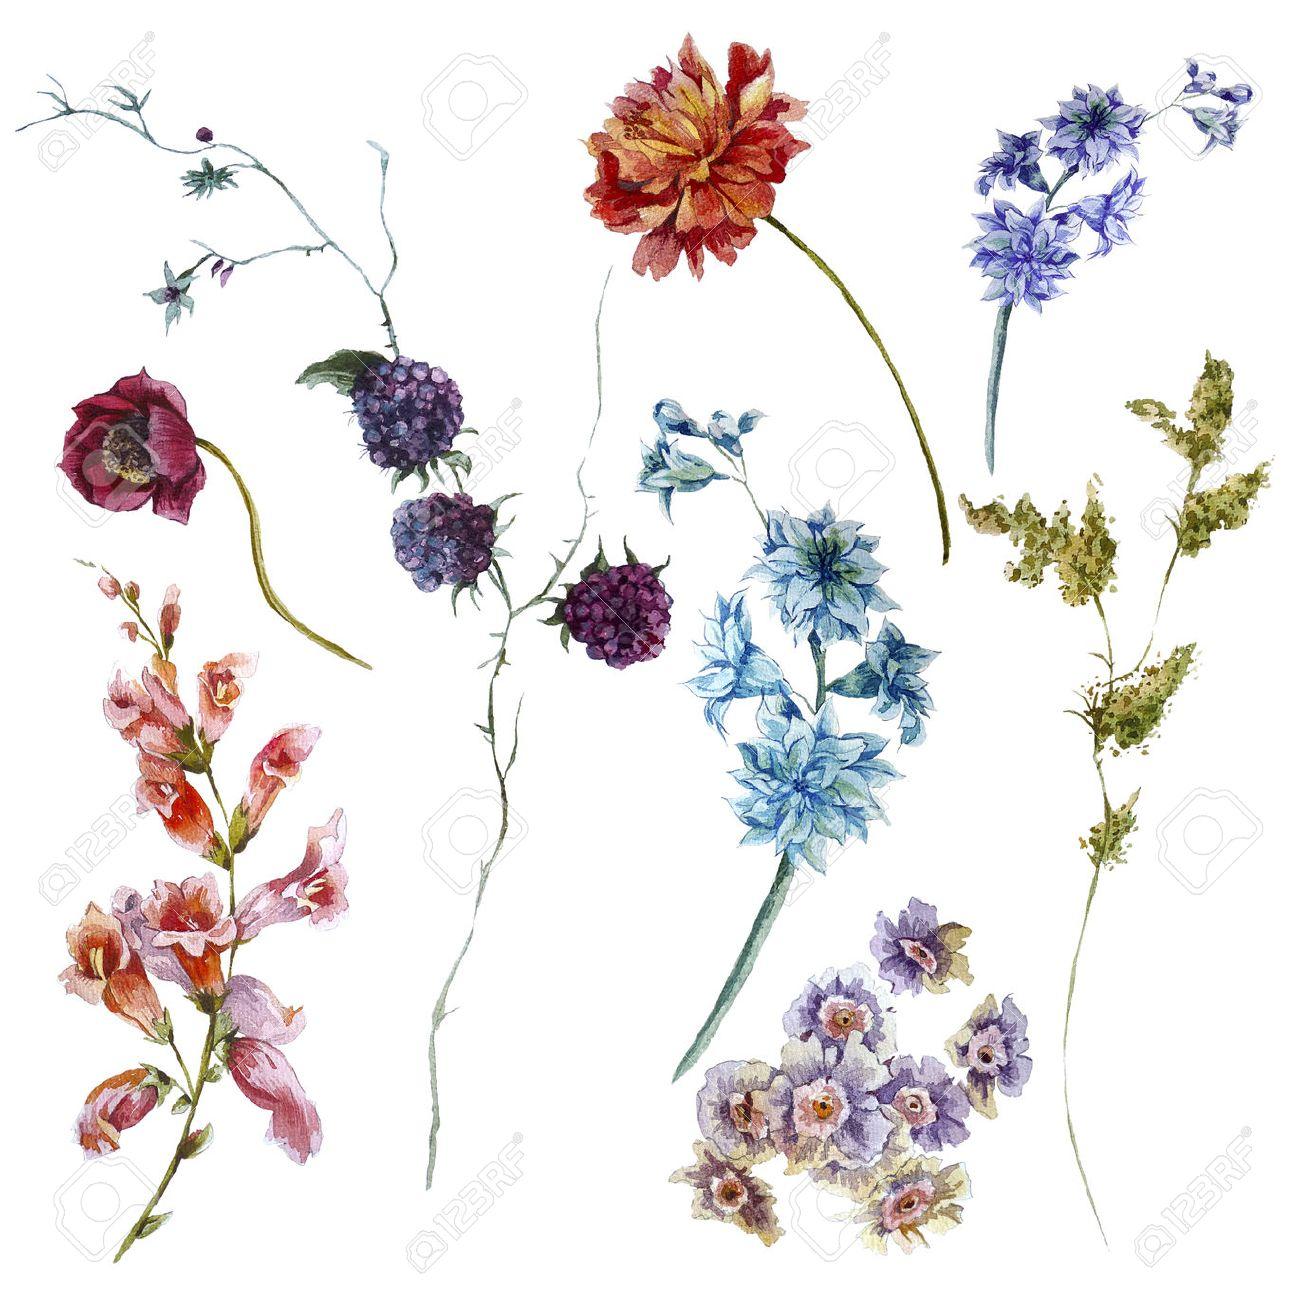 Set De Fleurs A L Aquarelle Brins De Feuilles Separement Fleur